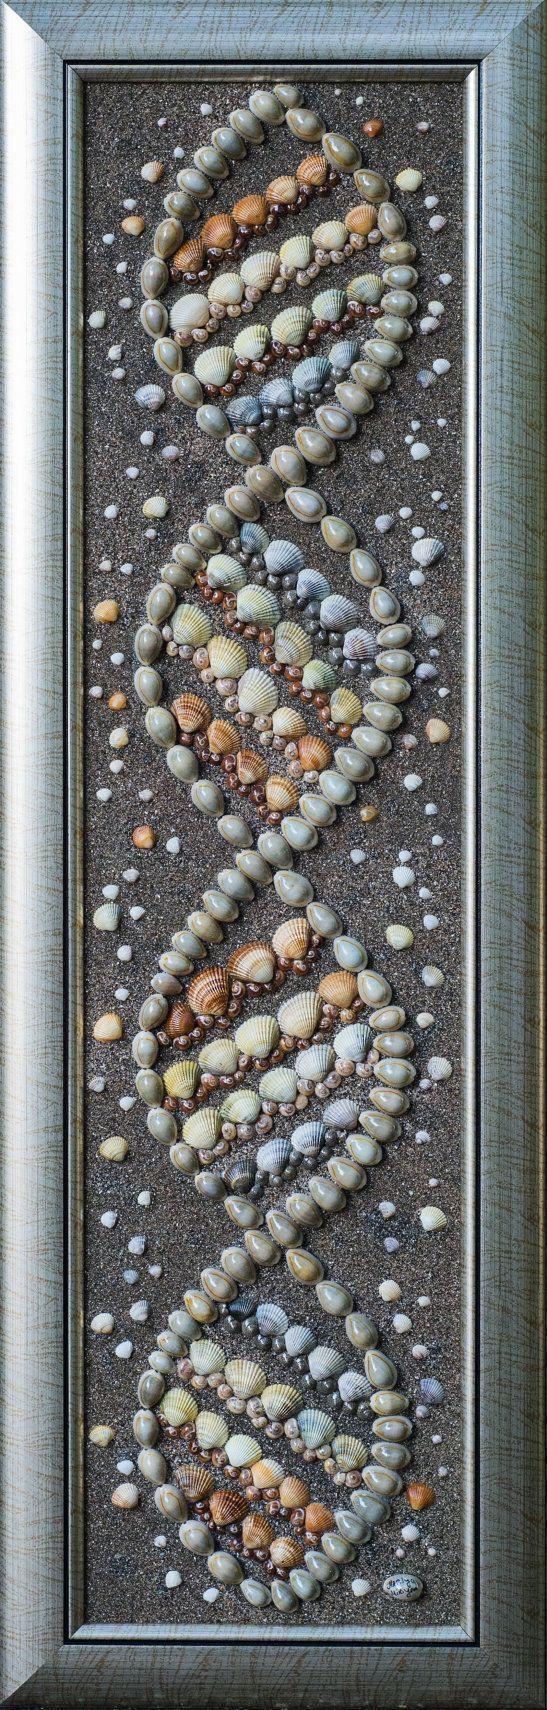 Best 25+ Seashell Art Ideas On Pinterest | Shell Art, Shell Crafts In Wall Art With Seashells (Image 4 of 20)